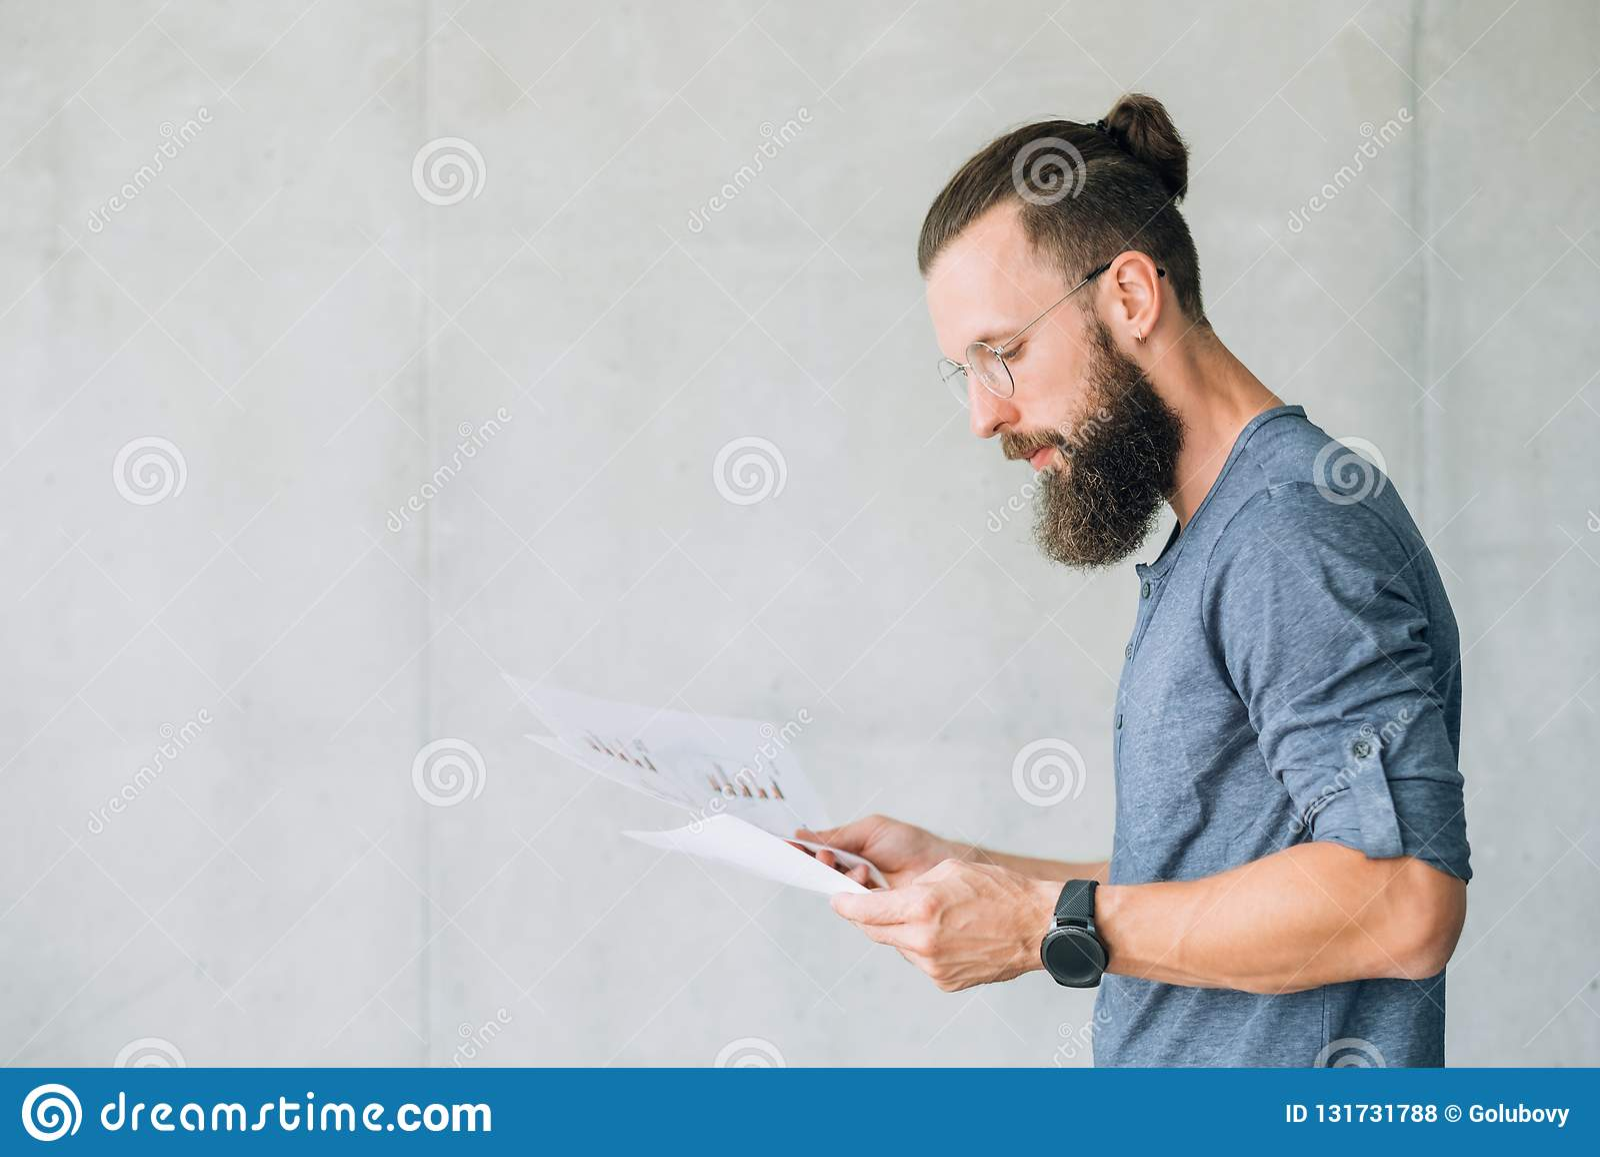 Focused man read document information report data